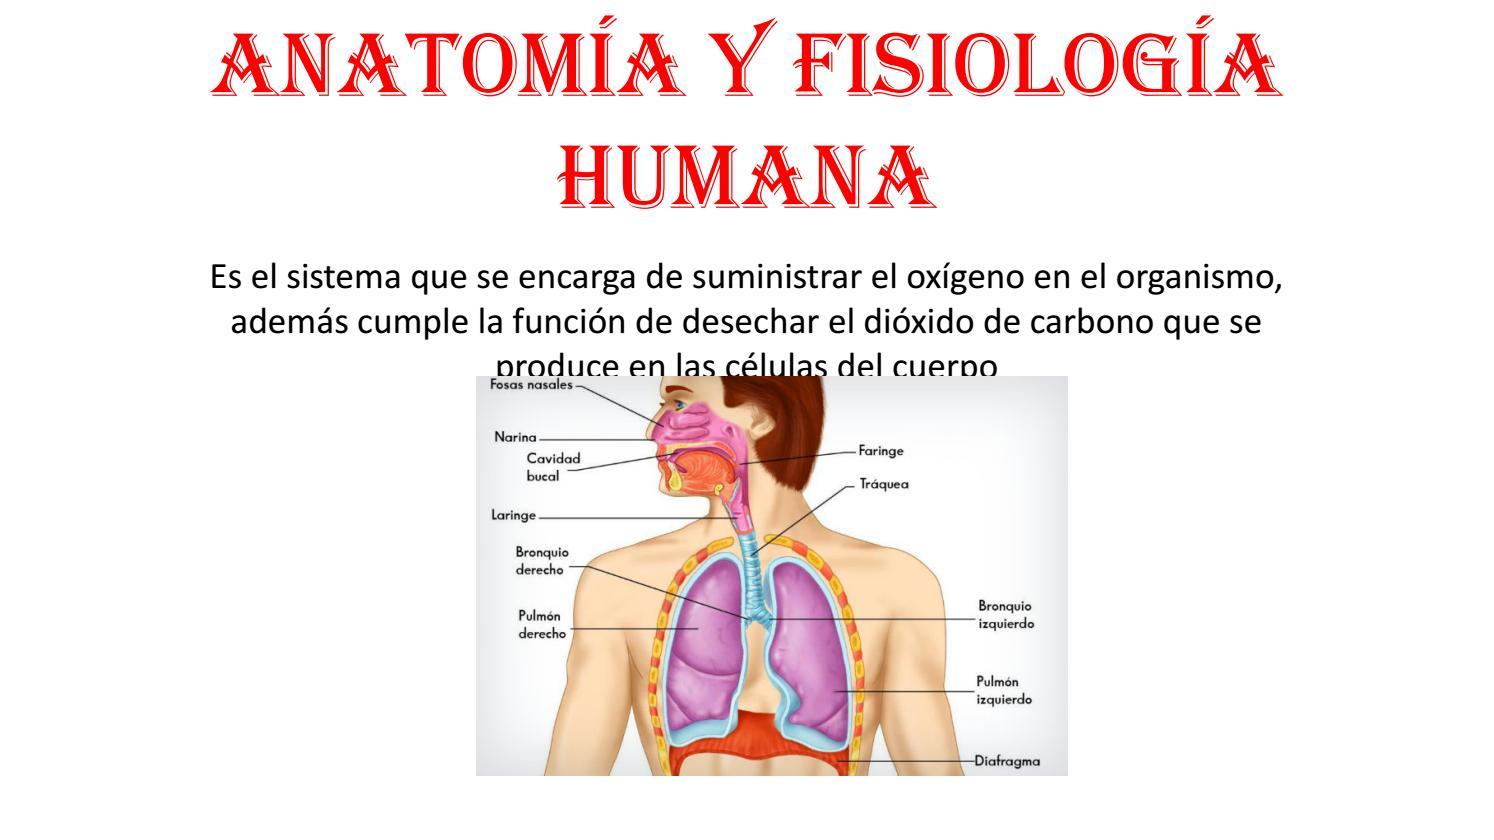 Anatomía y fisiología humana by Jorge Tenelema - issuu